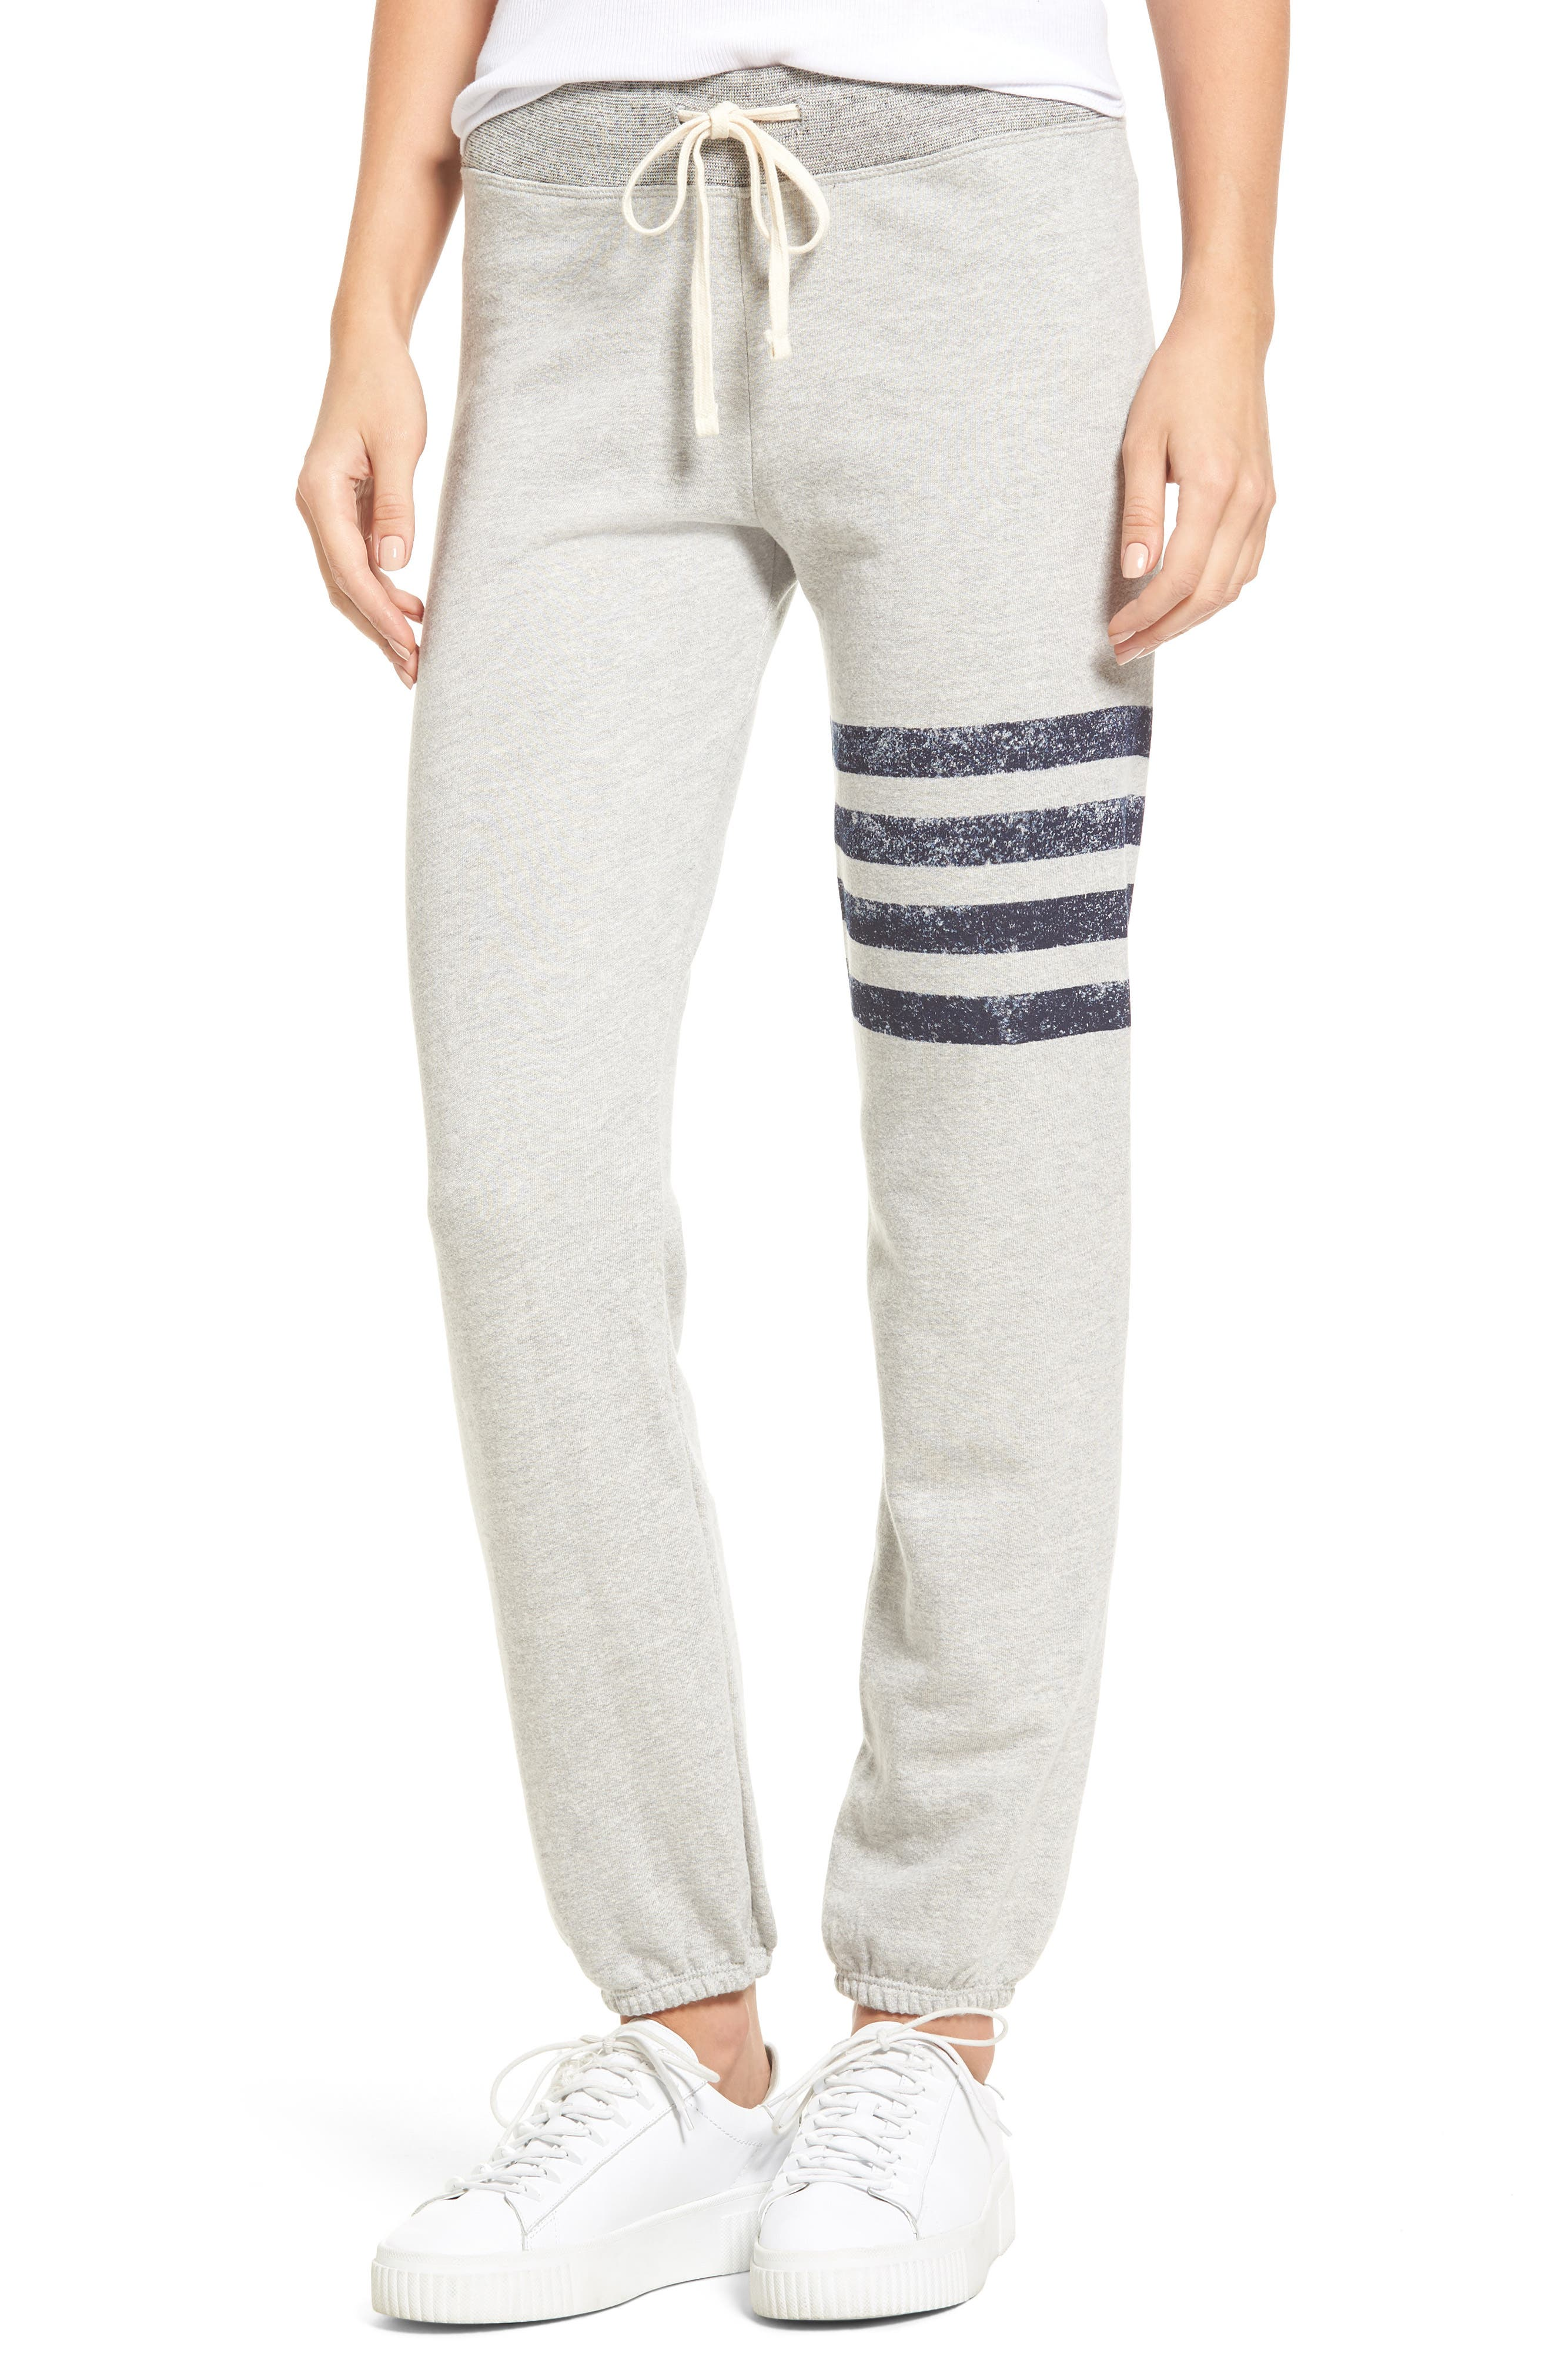 Stripe Yoga Pants,                         Main,                         color, Soft Black